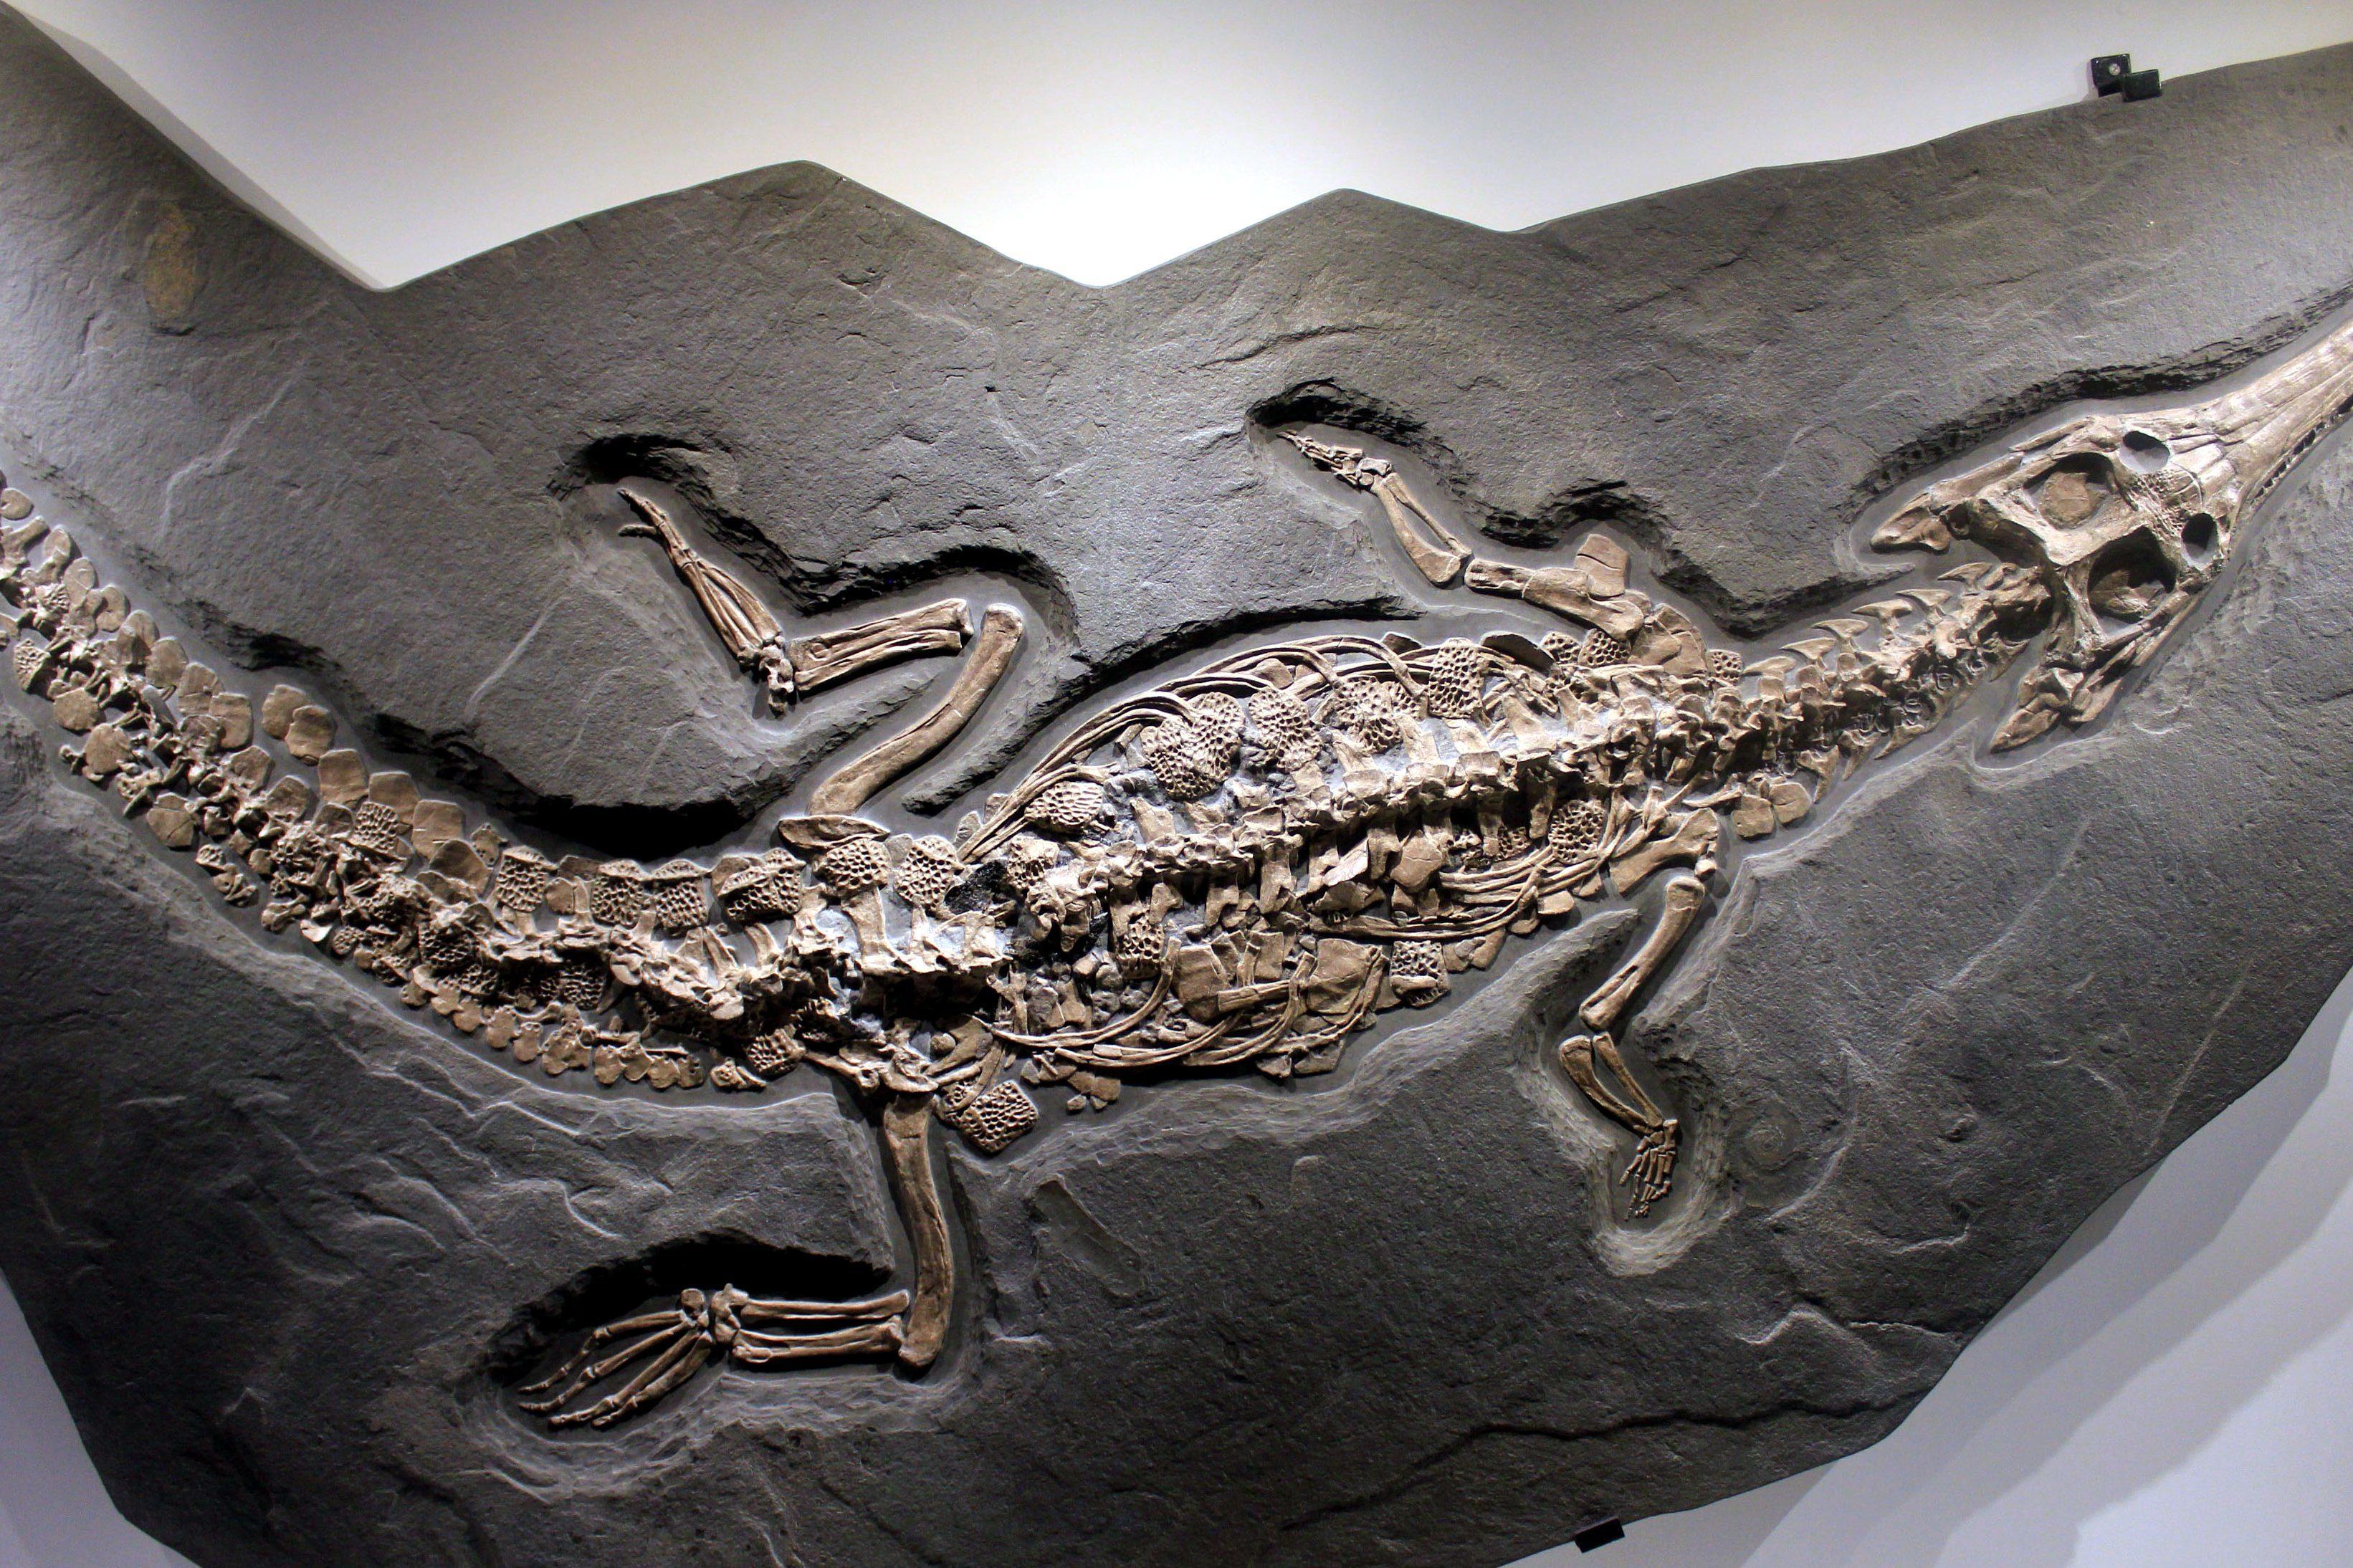 Imagen gratis: Steneosaurus, fósil, roca, edad de piedra